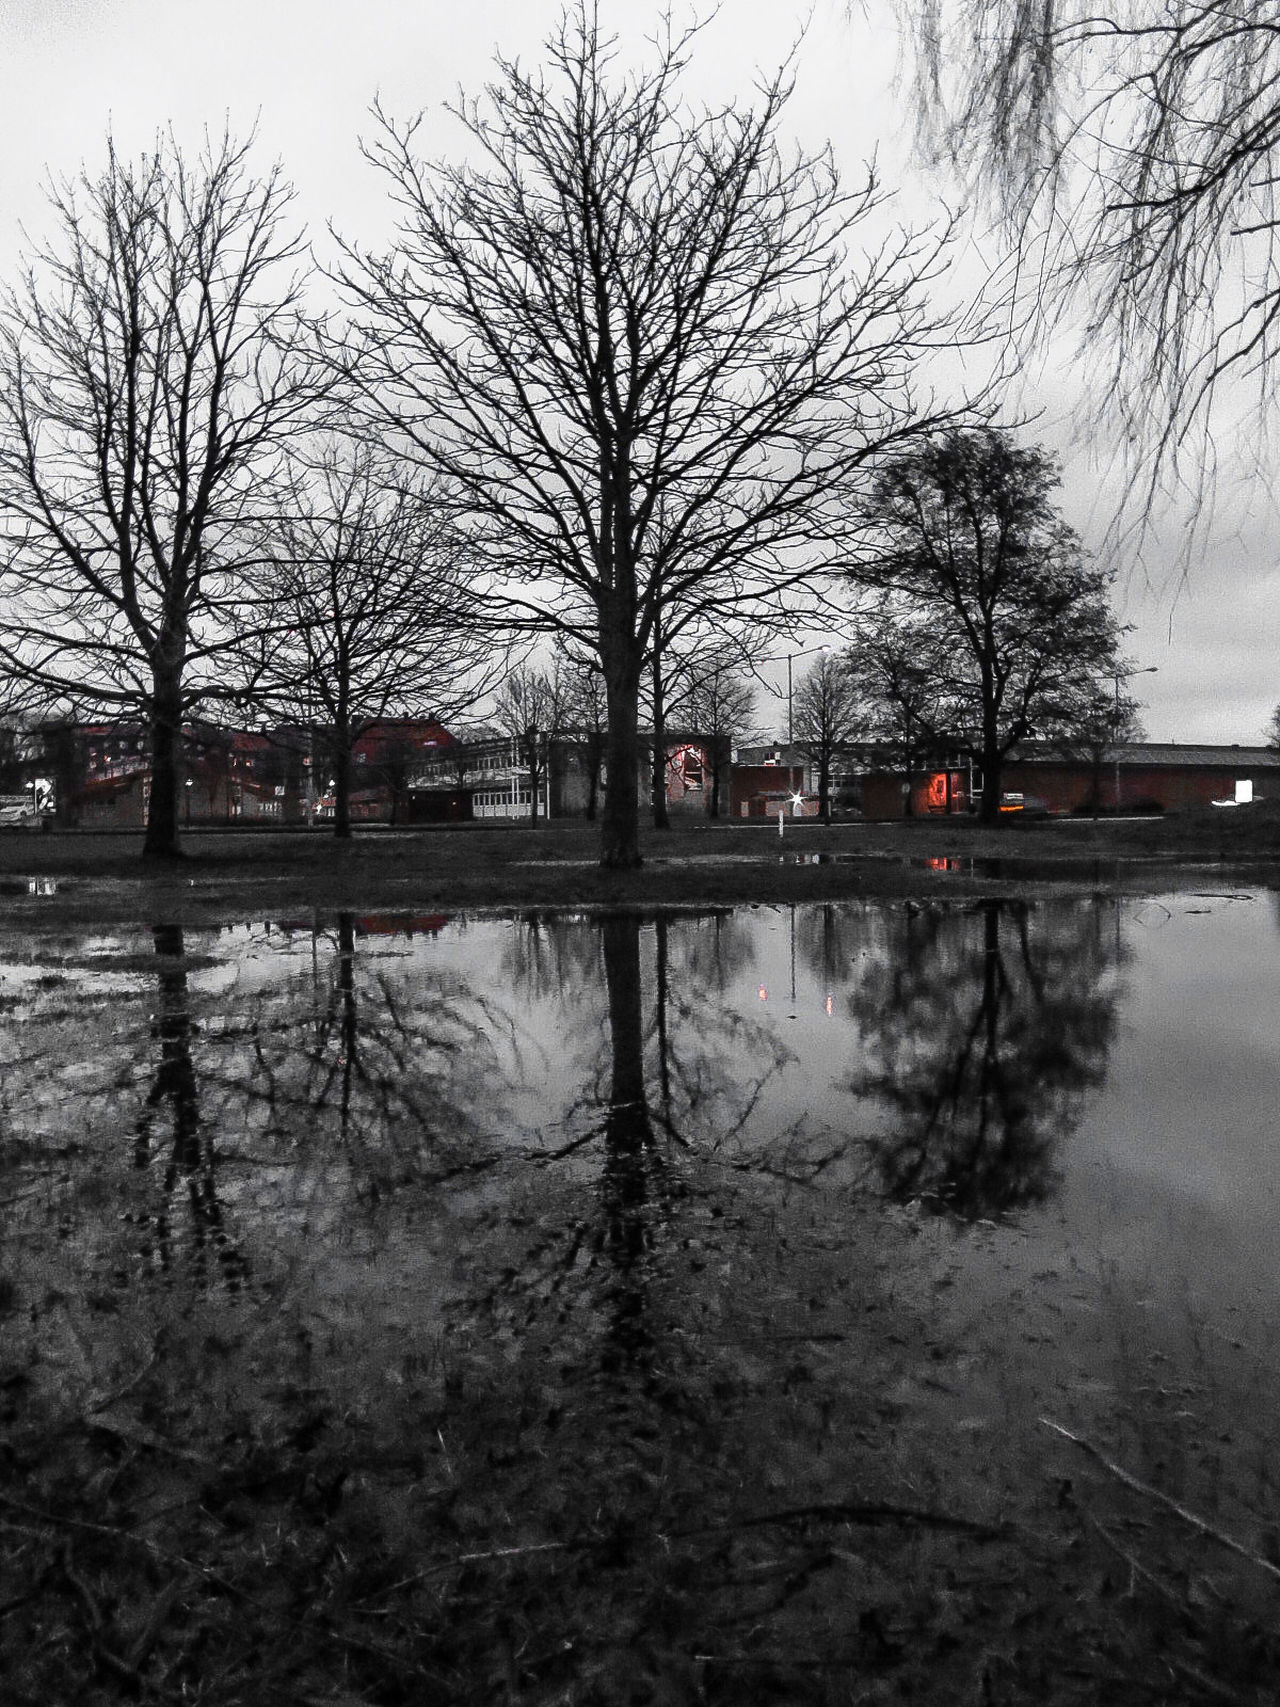 Landscape Trees Reflections Evening Walk